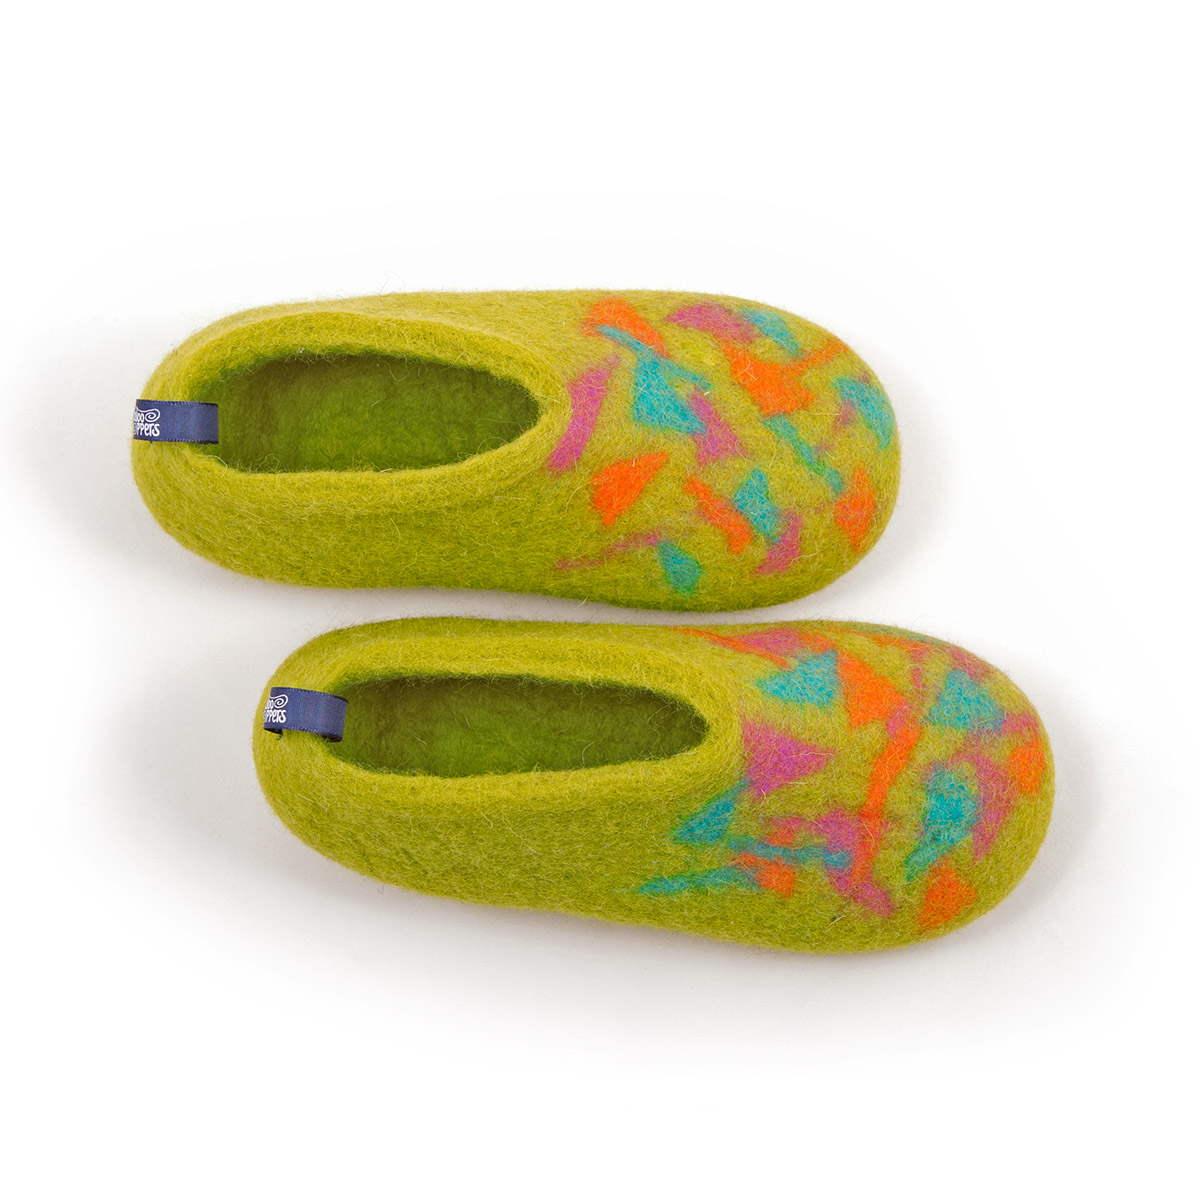 wool kids slippers CONFETTI BITS lime